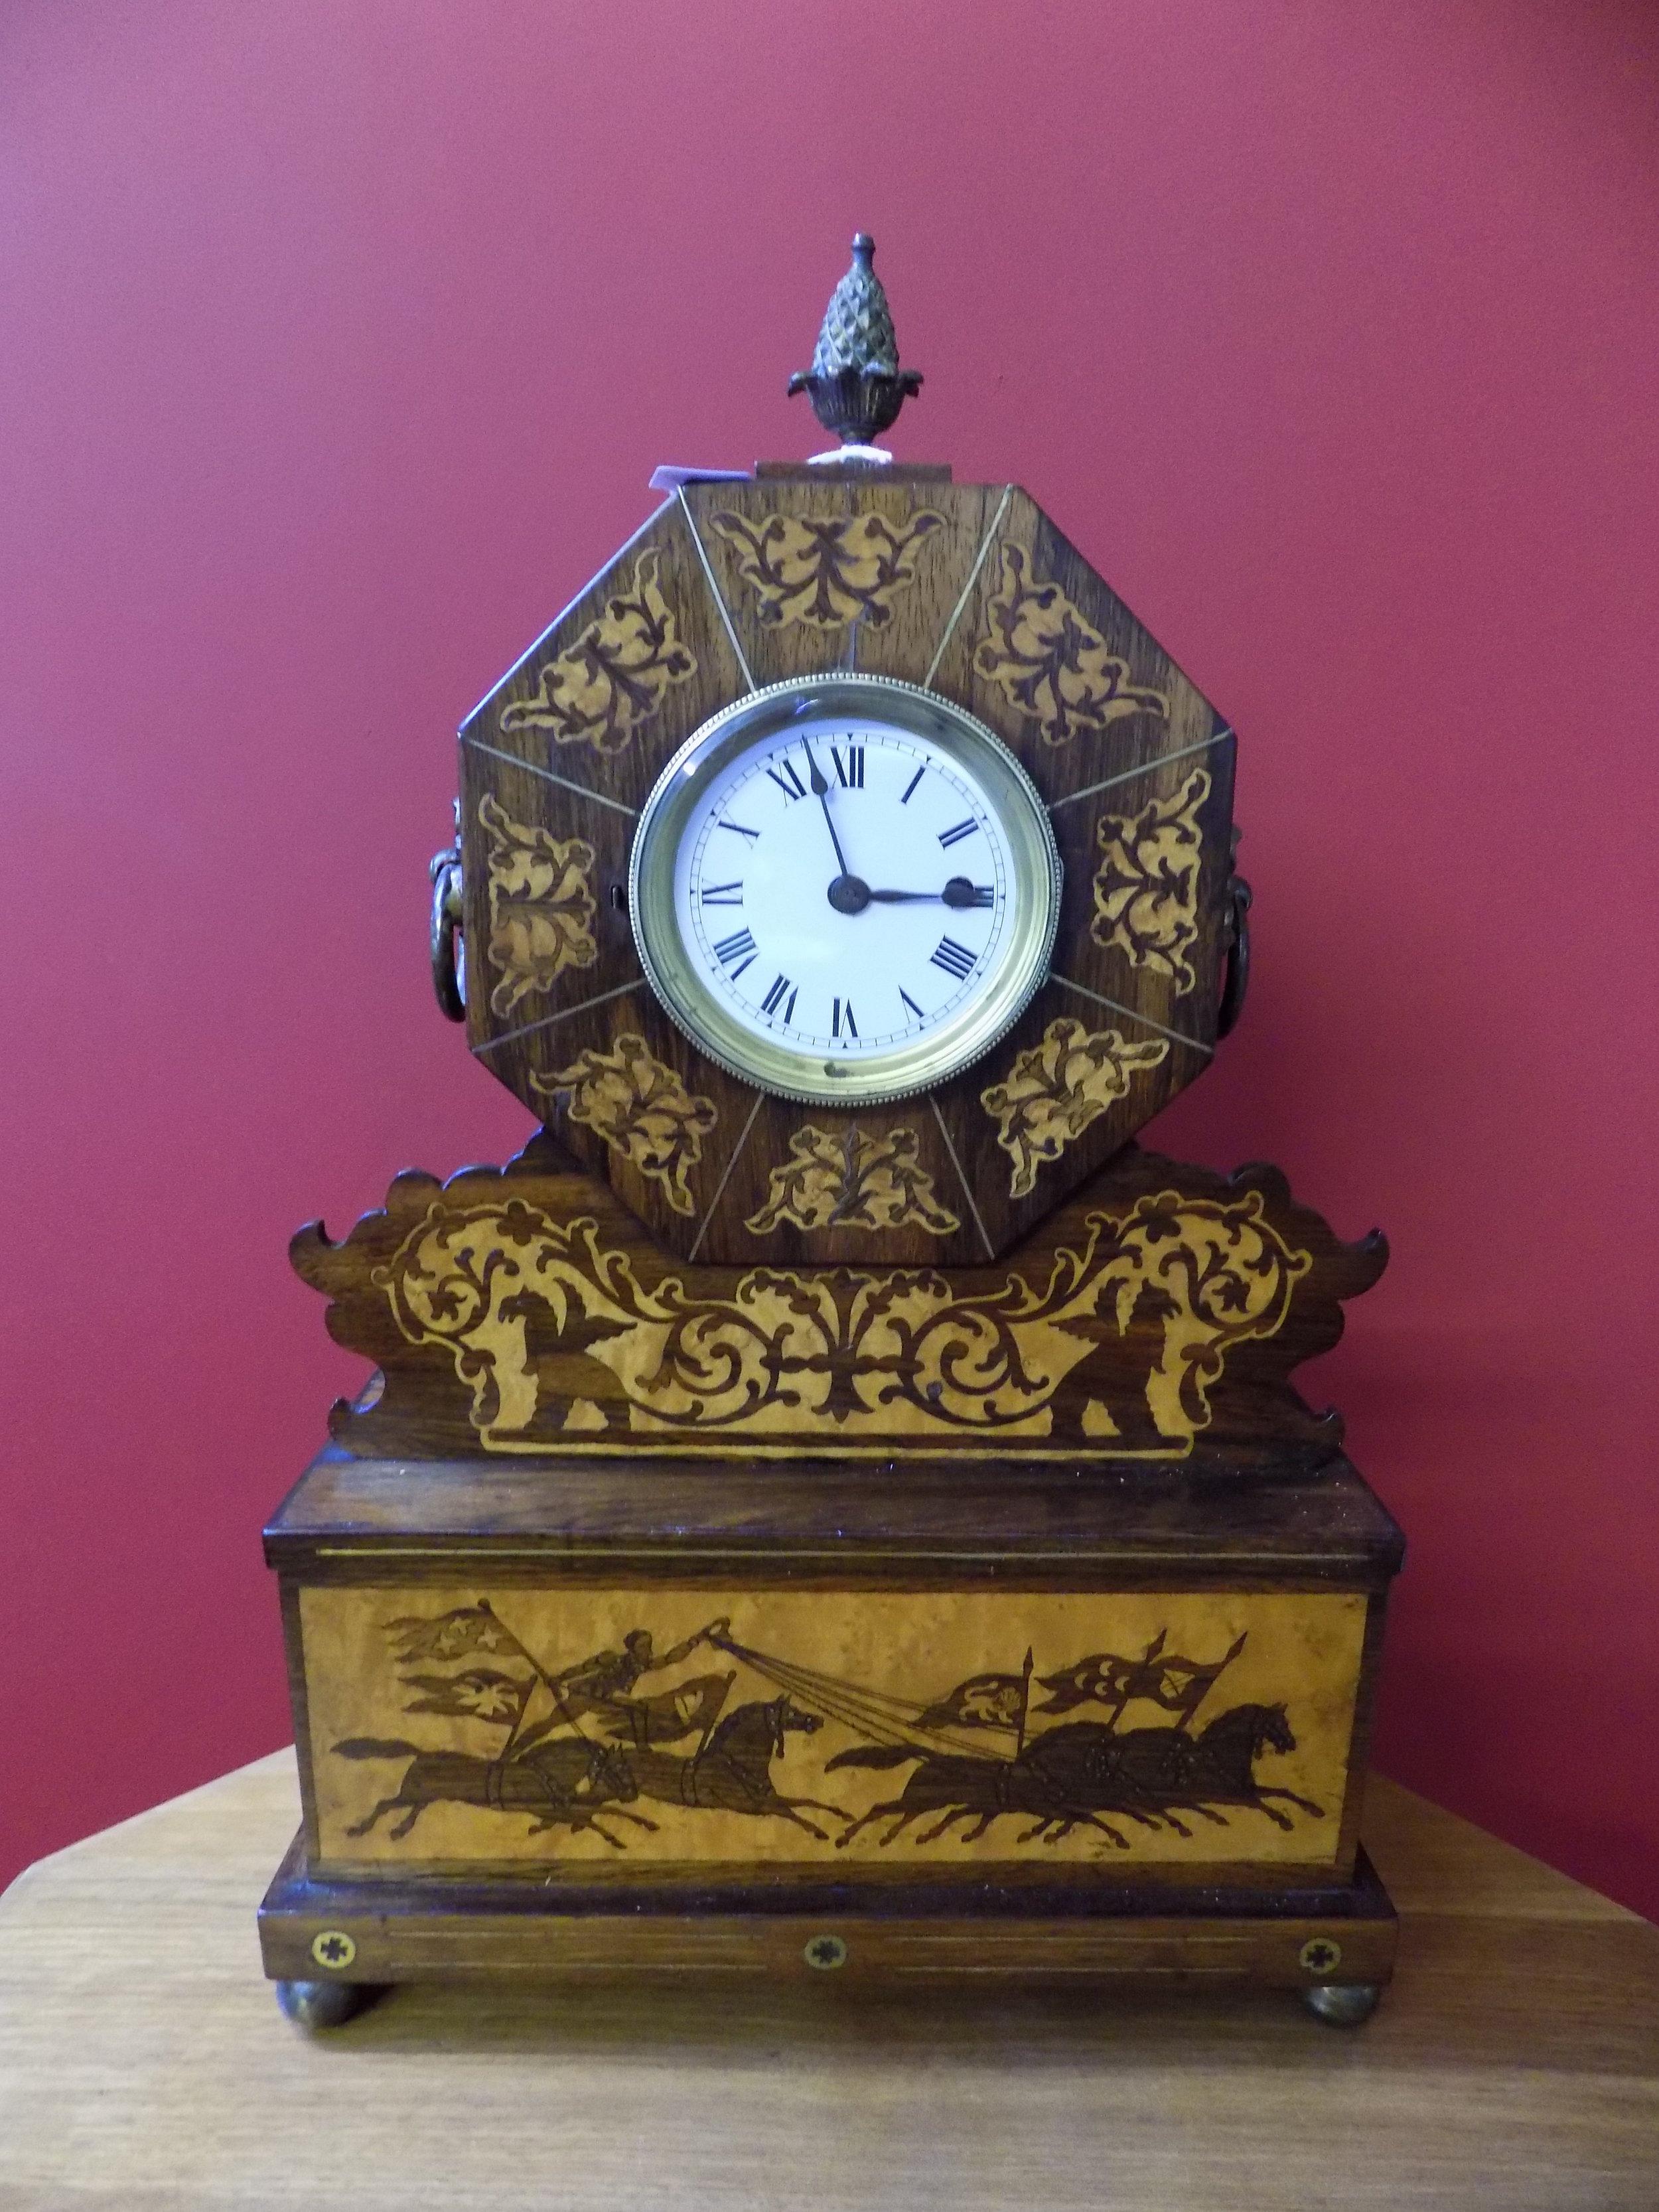 American inlaid mantel clock £240.00